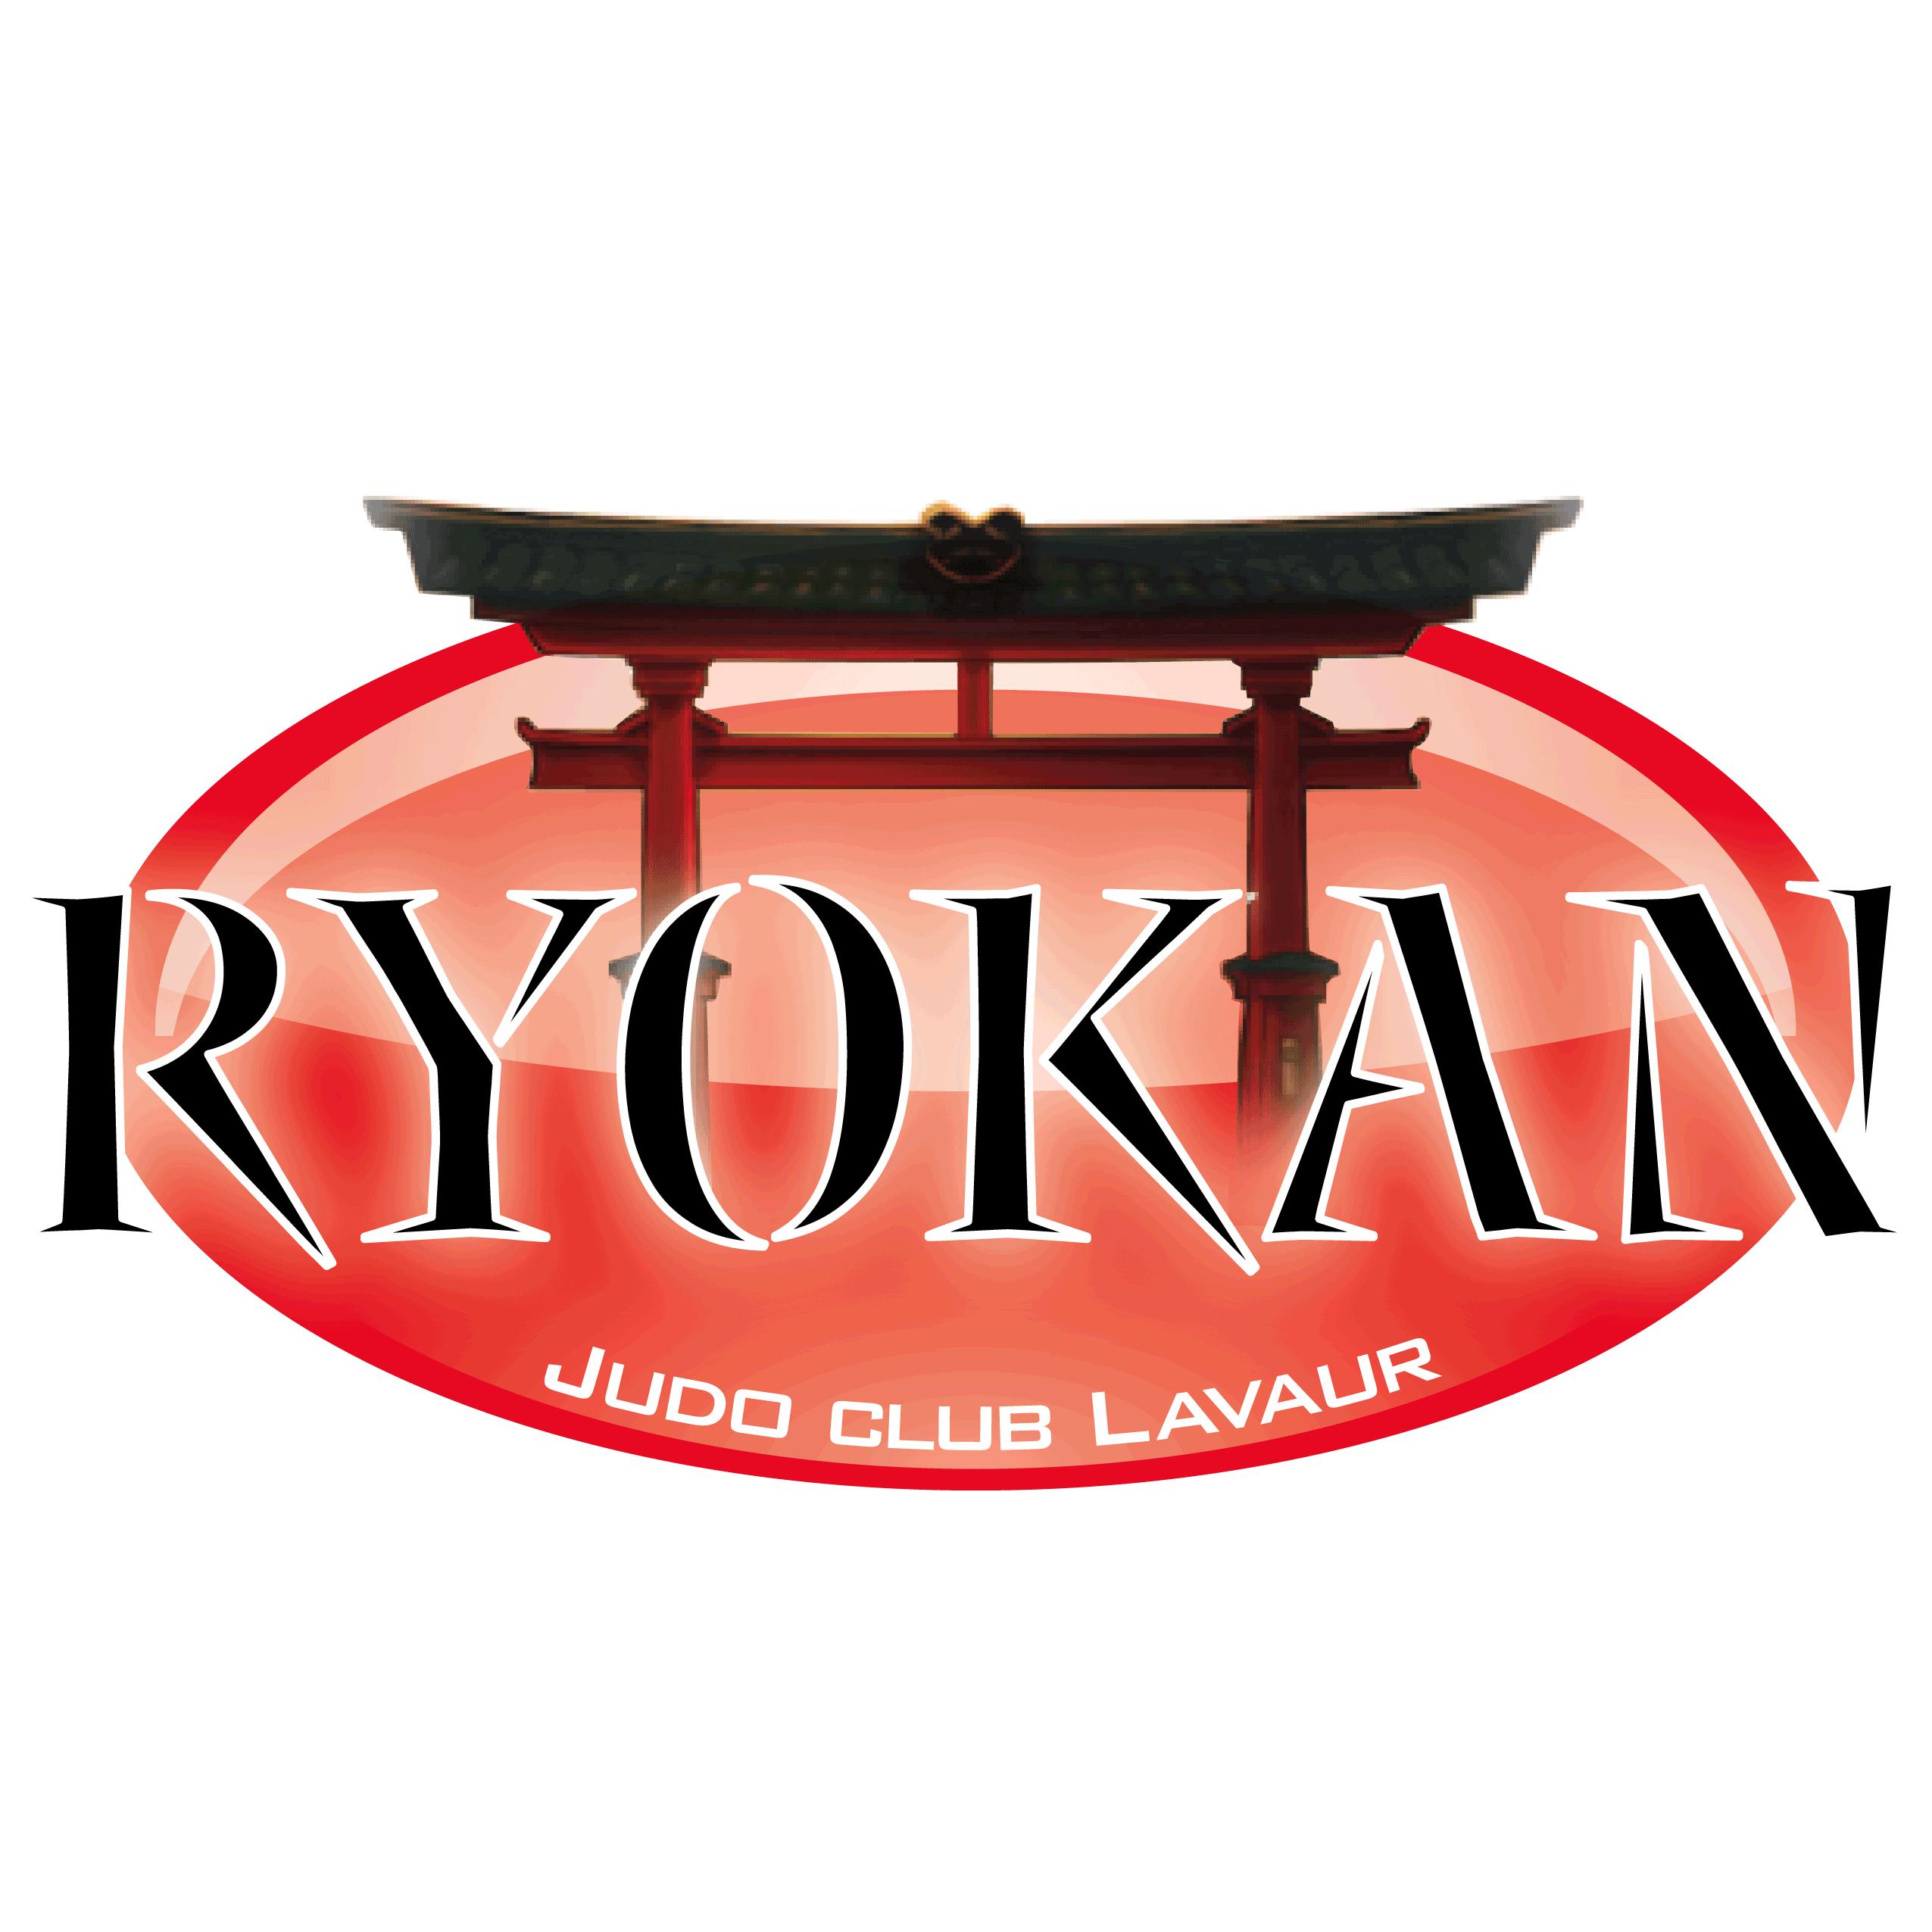 Ryokan Judo Club Lavaur